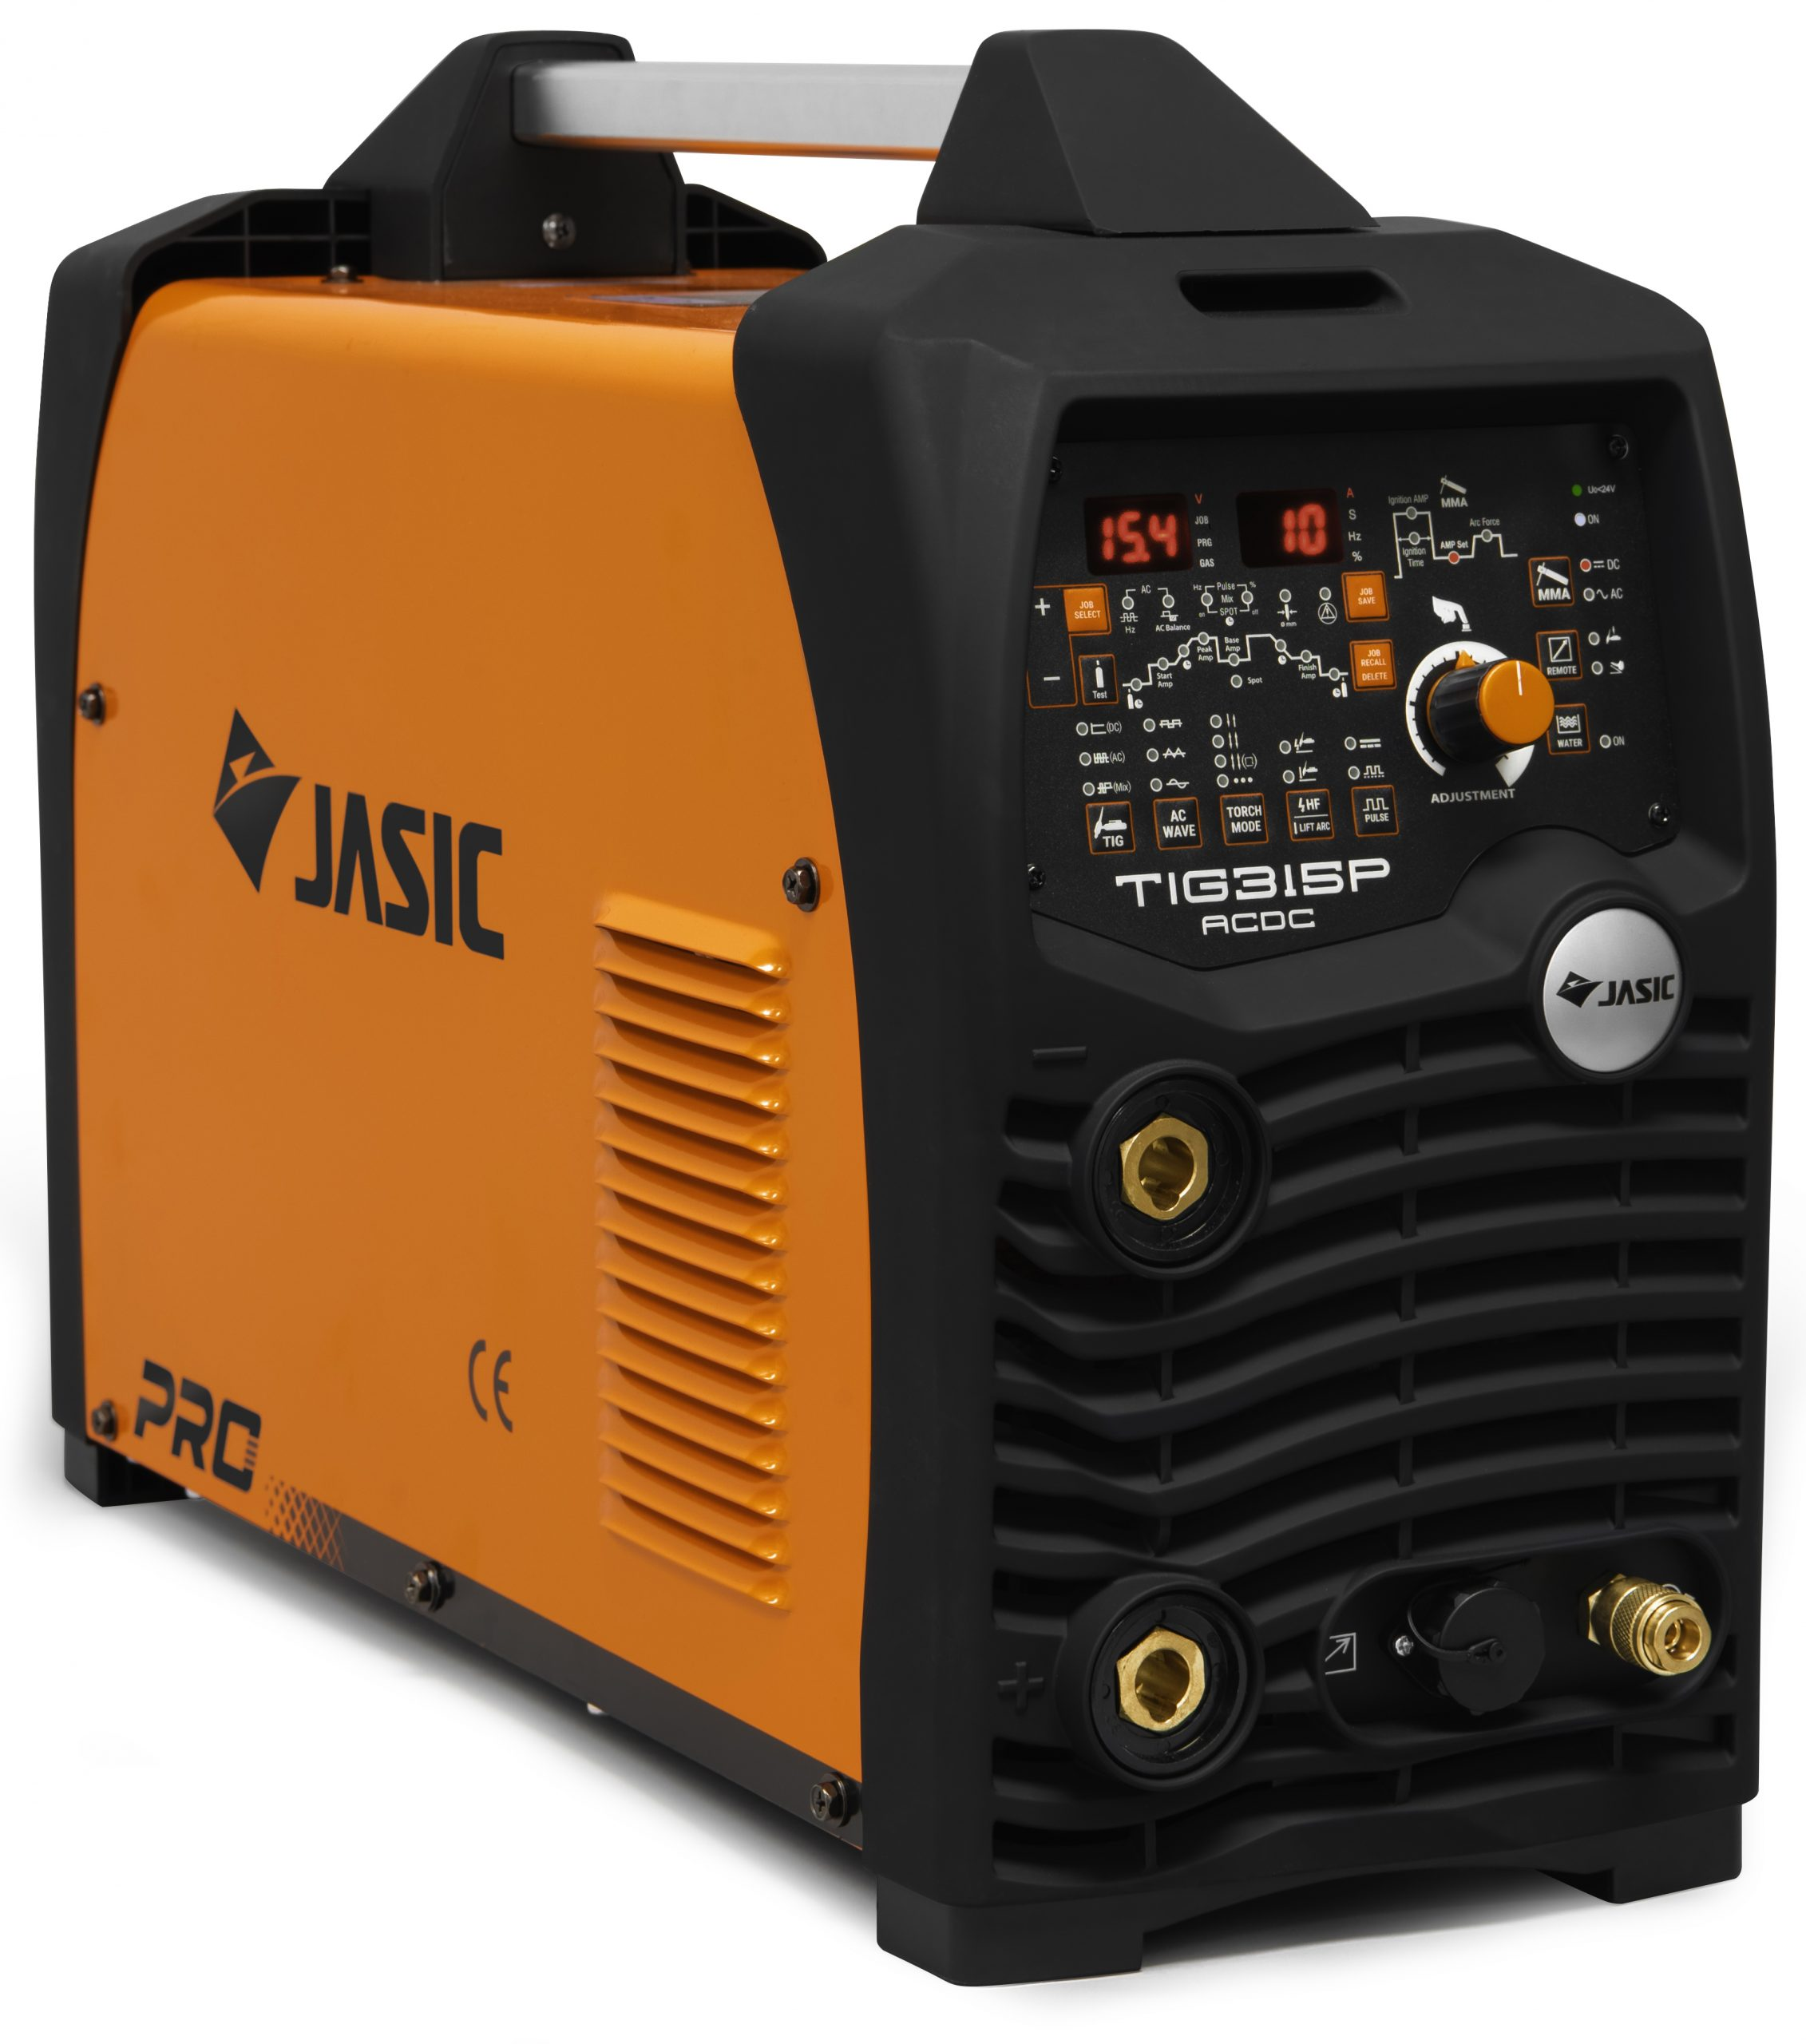 TIG 315P AC/DC Pulse Multi Wave Digital | Blandford Tools